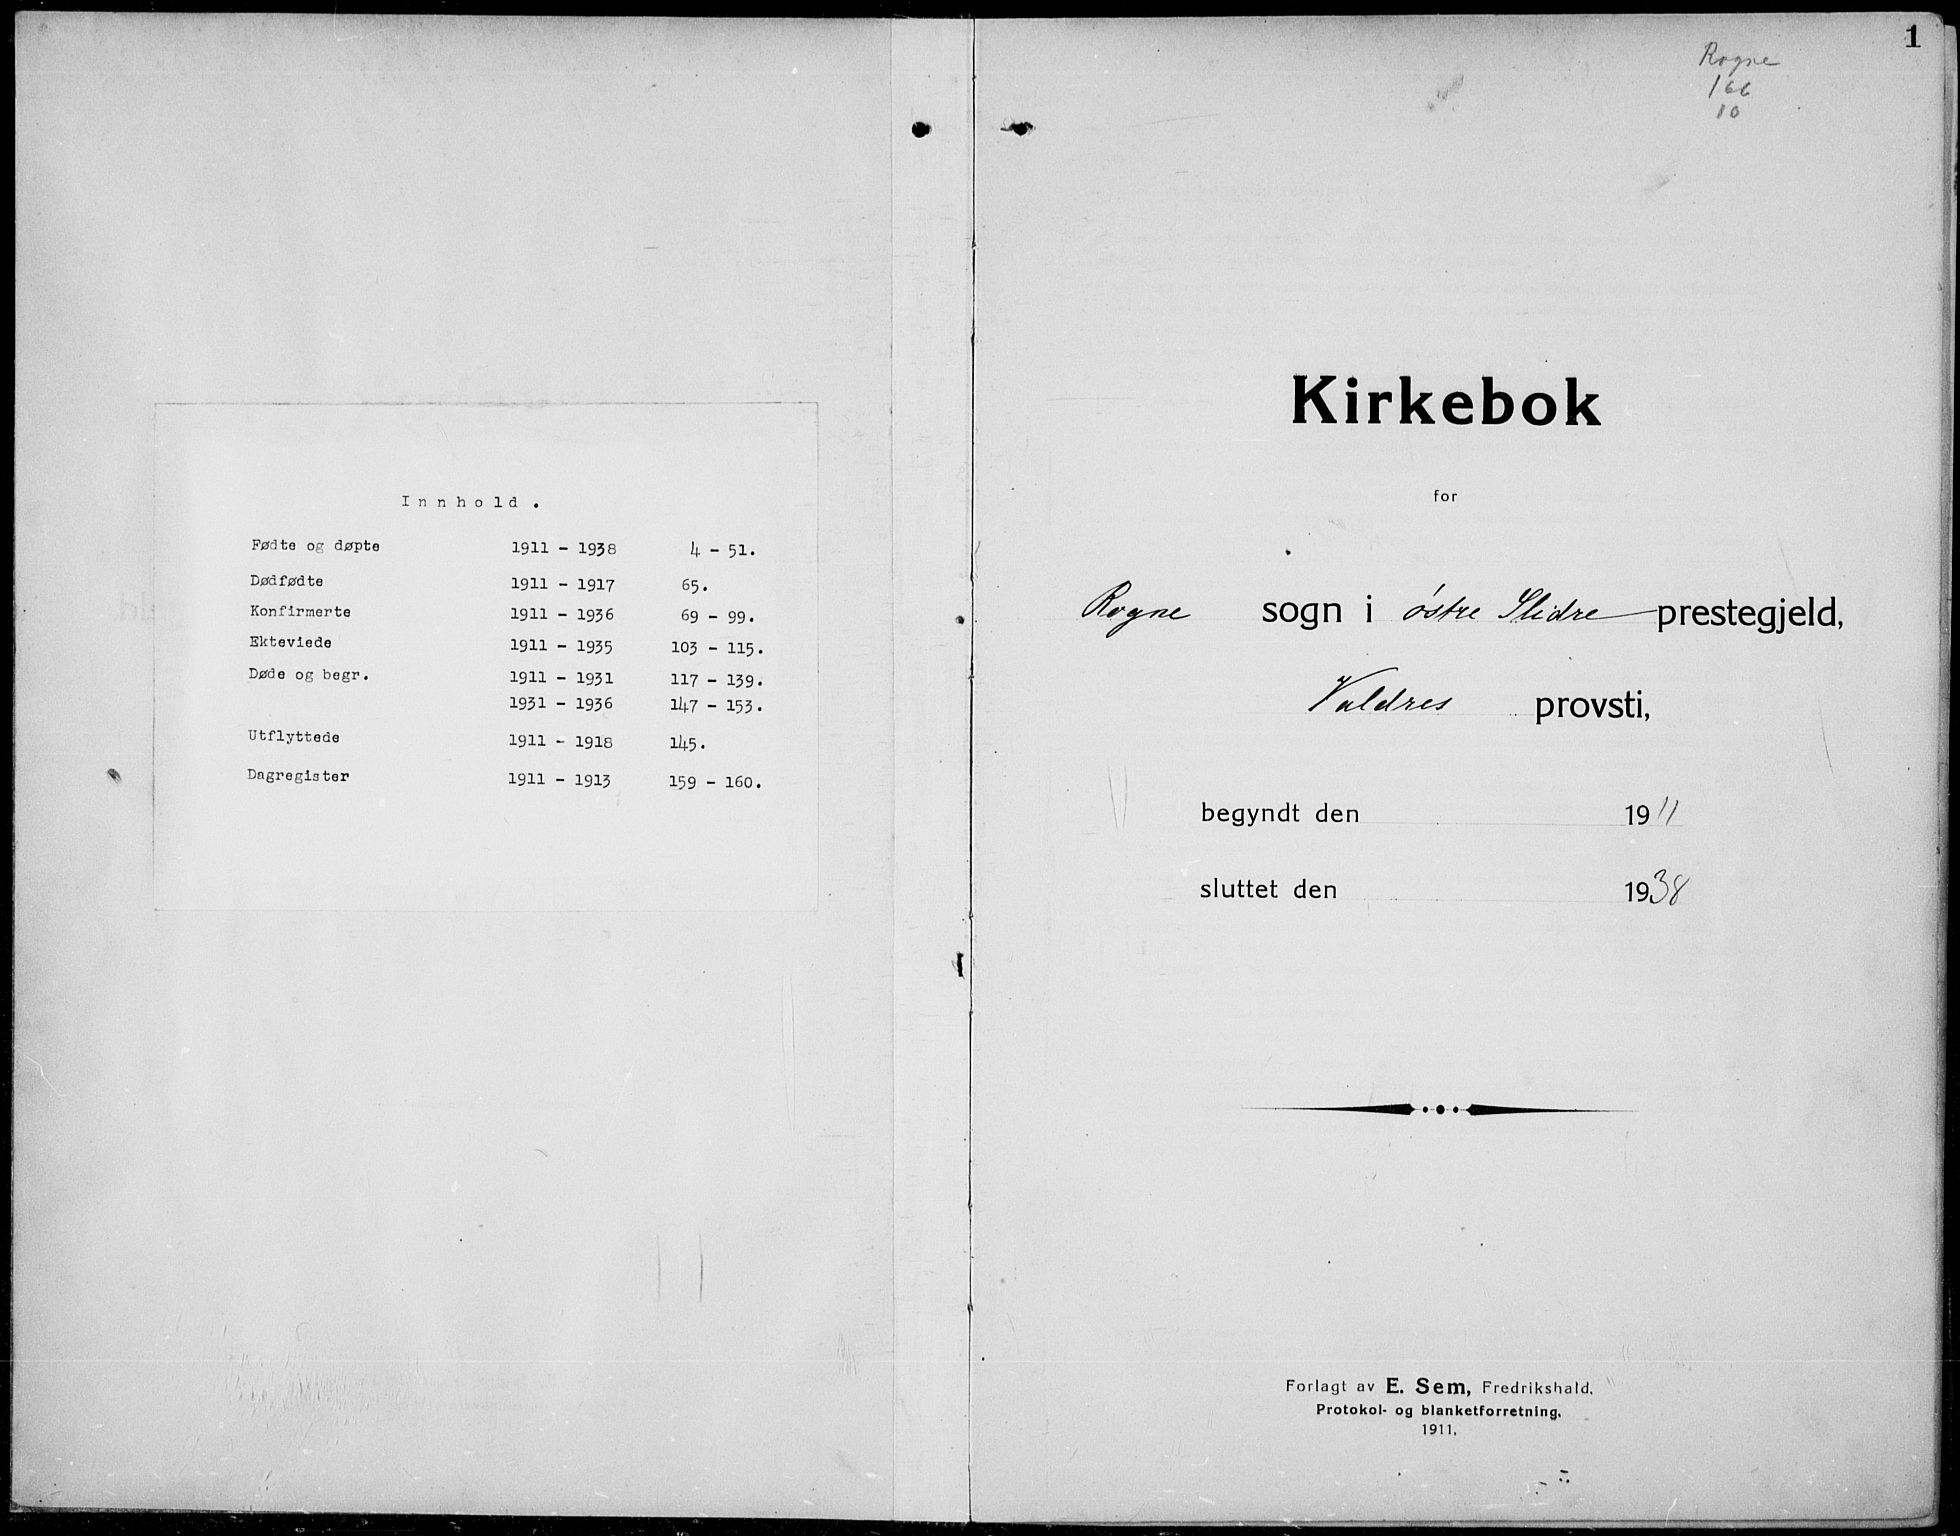 SAH, Øystre Slidre prestekontor, Klokkerbok nr. 8, 1911-1938, s. 1